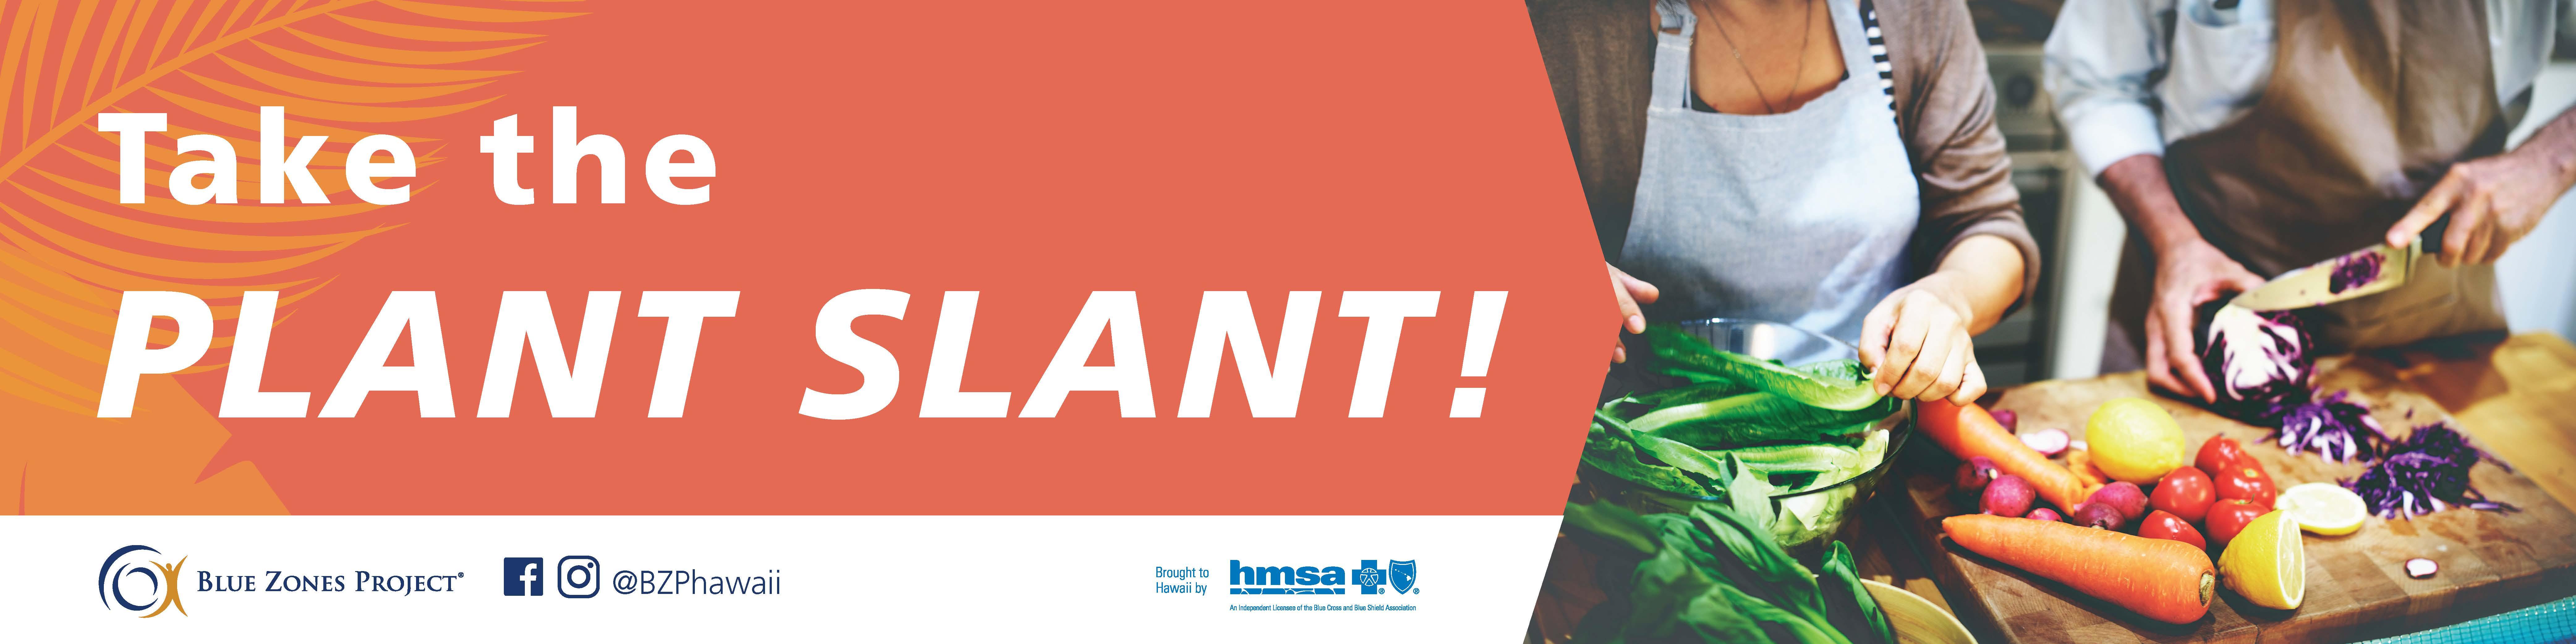 Take the Plant Slant!